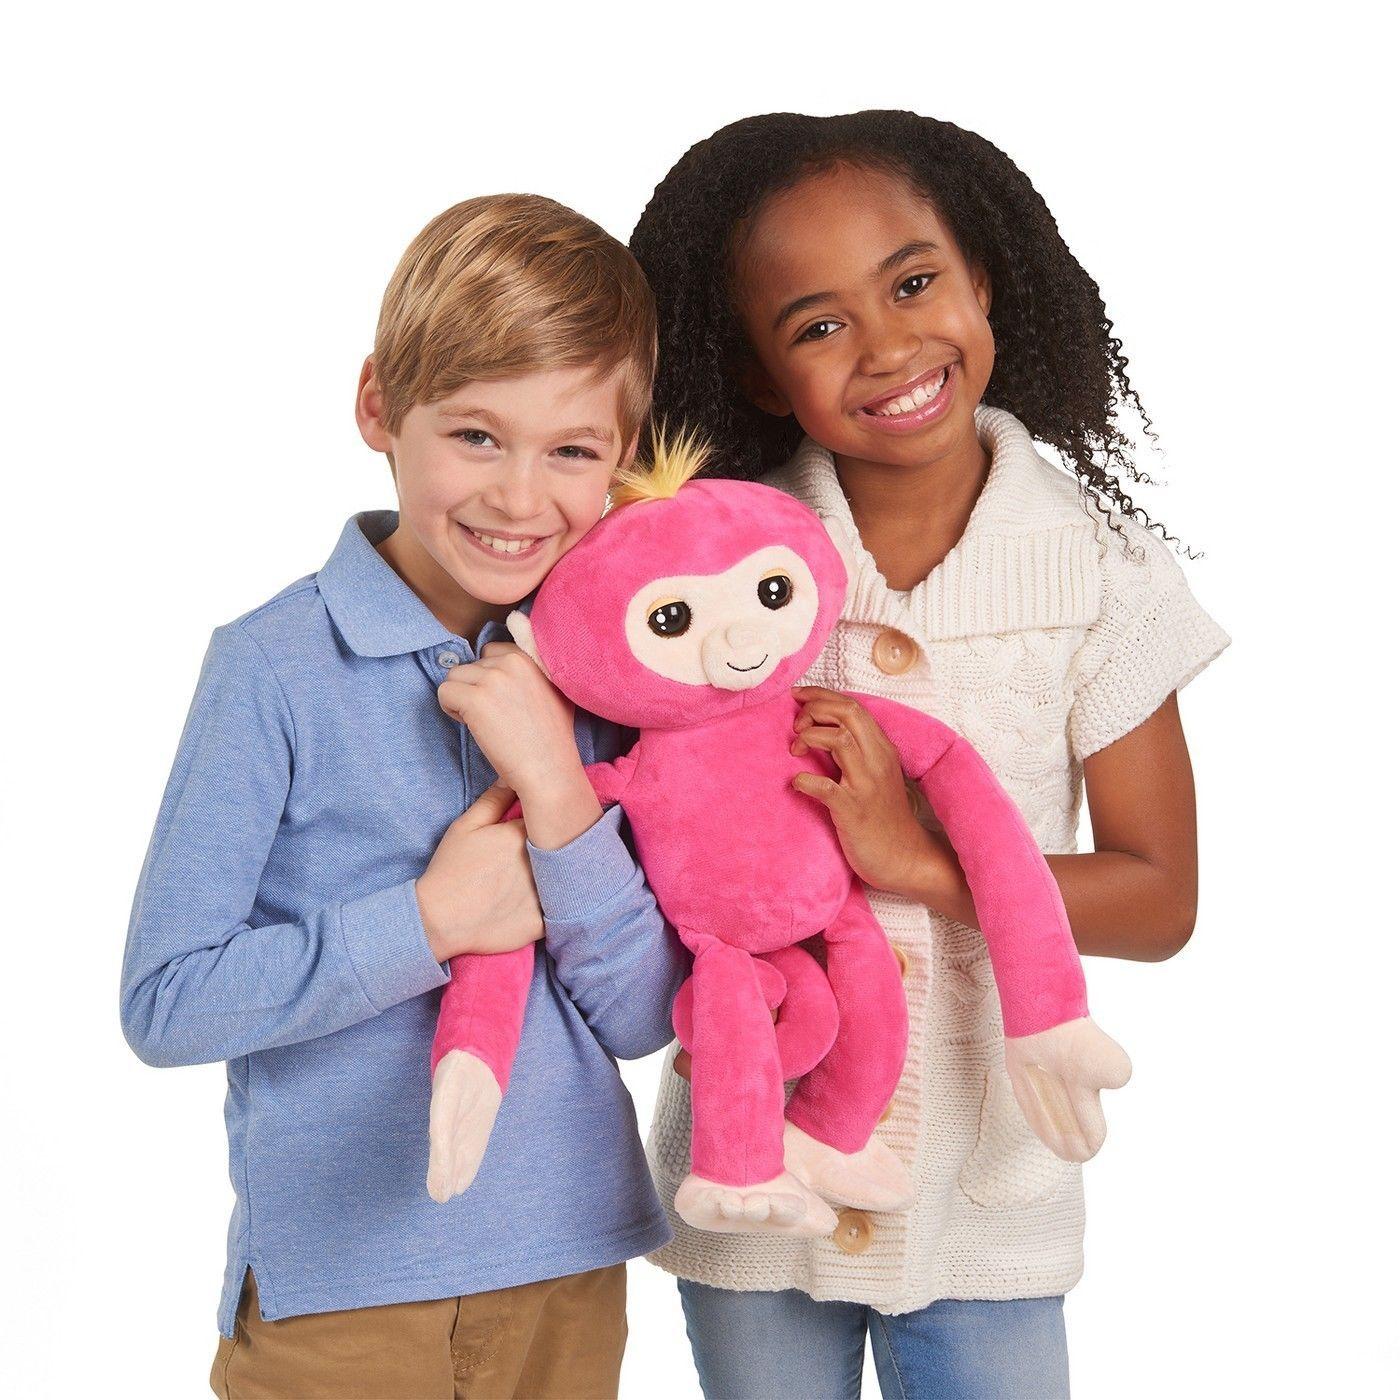 WooWee Fingerlings HUGS - Bella Pink- Friendly Interactive Plush Monkey Toy